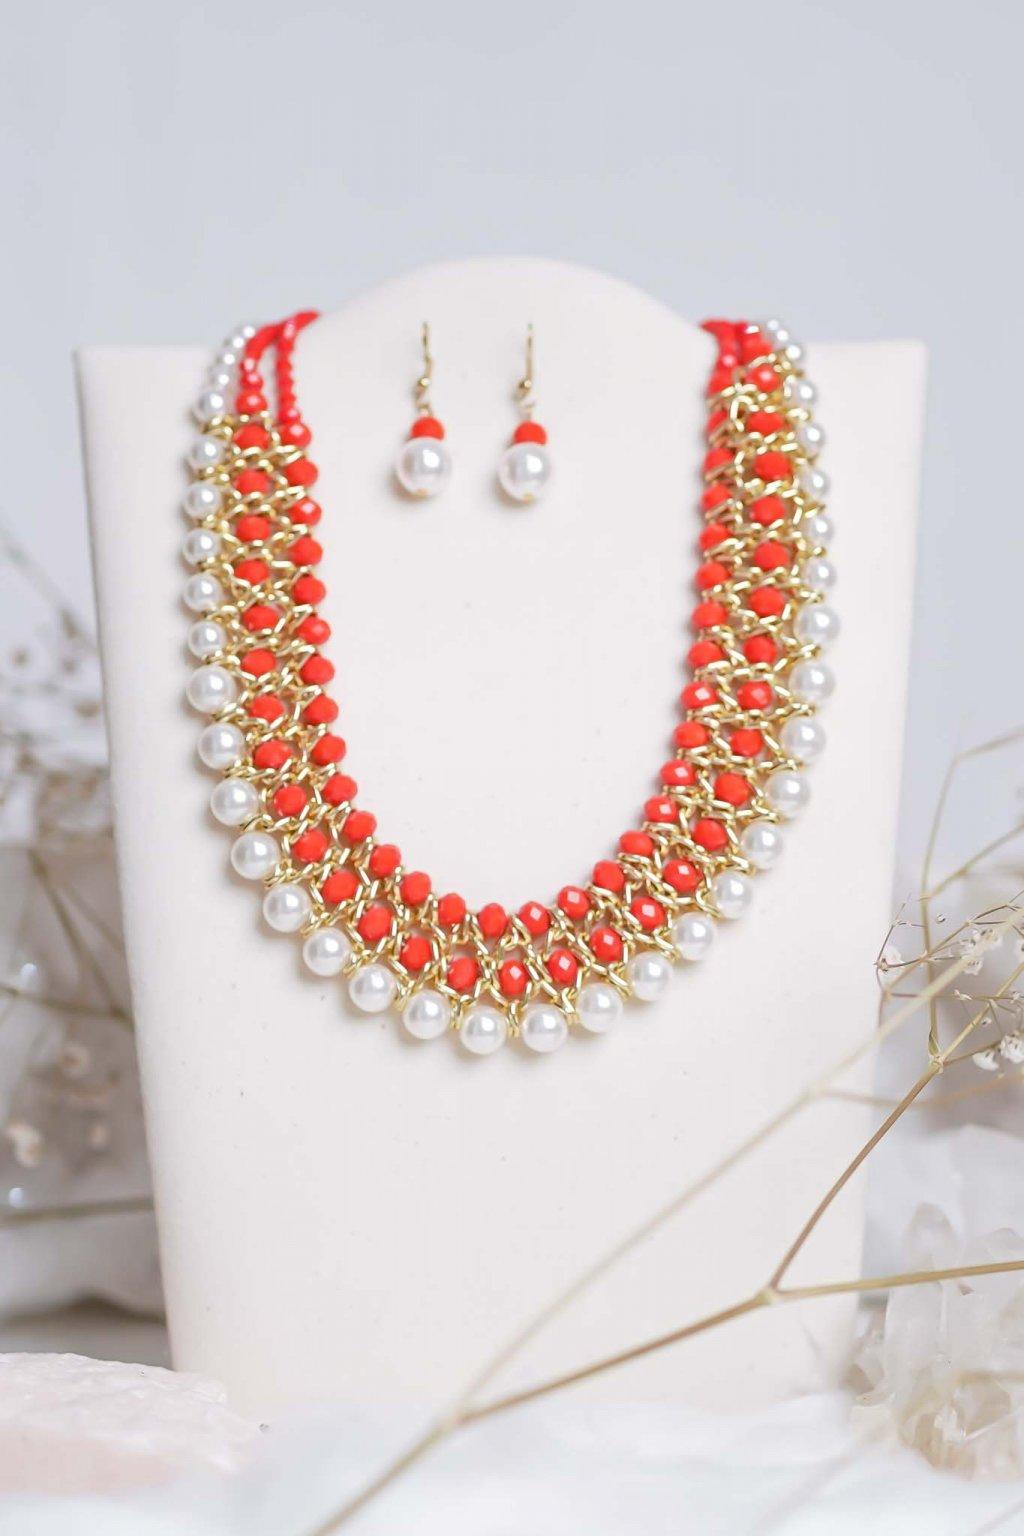 náhrdelník, šperk, spoločenská náhrdelník, náhrdelník na bežný deň, výrazný náhrdelník, jemný náhrdelník, šperky, náhrdelník na ples, svadbu, stužkovú 33